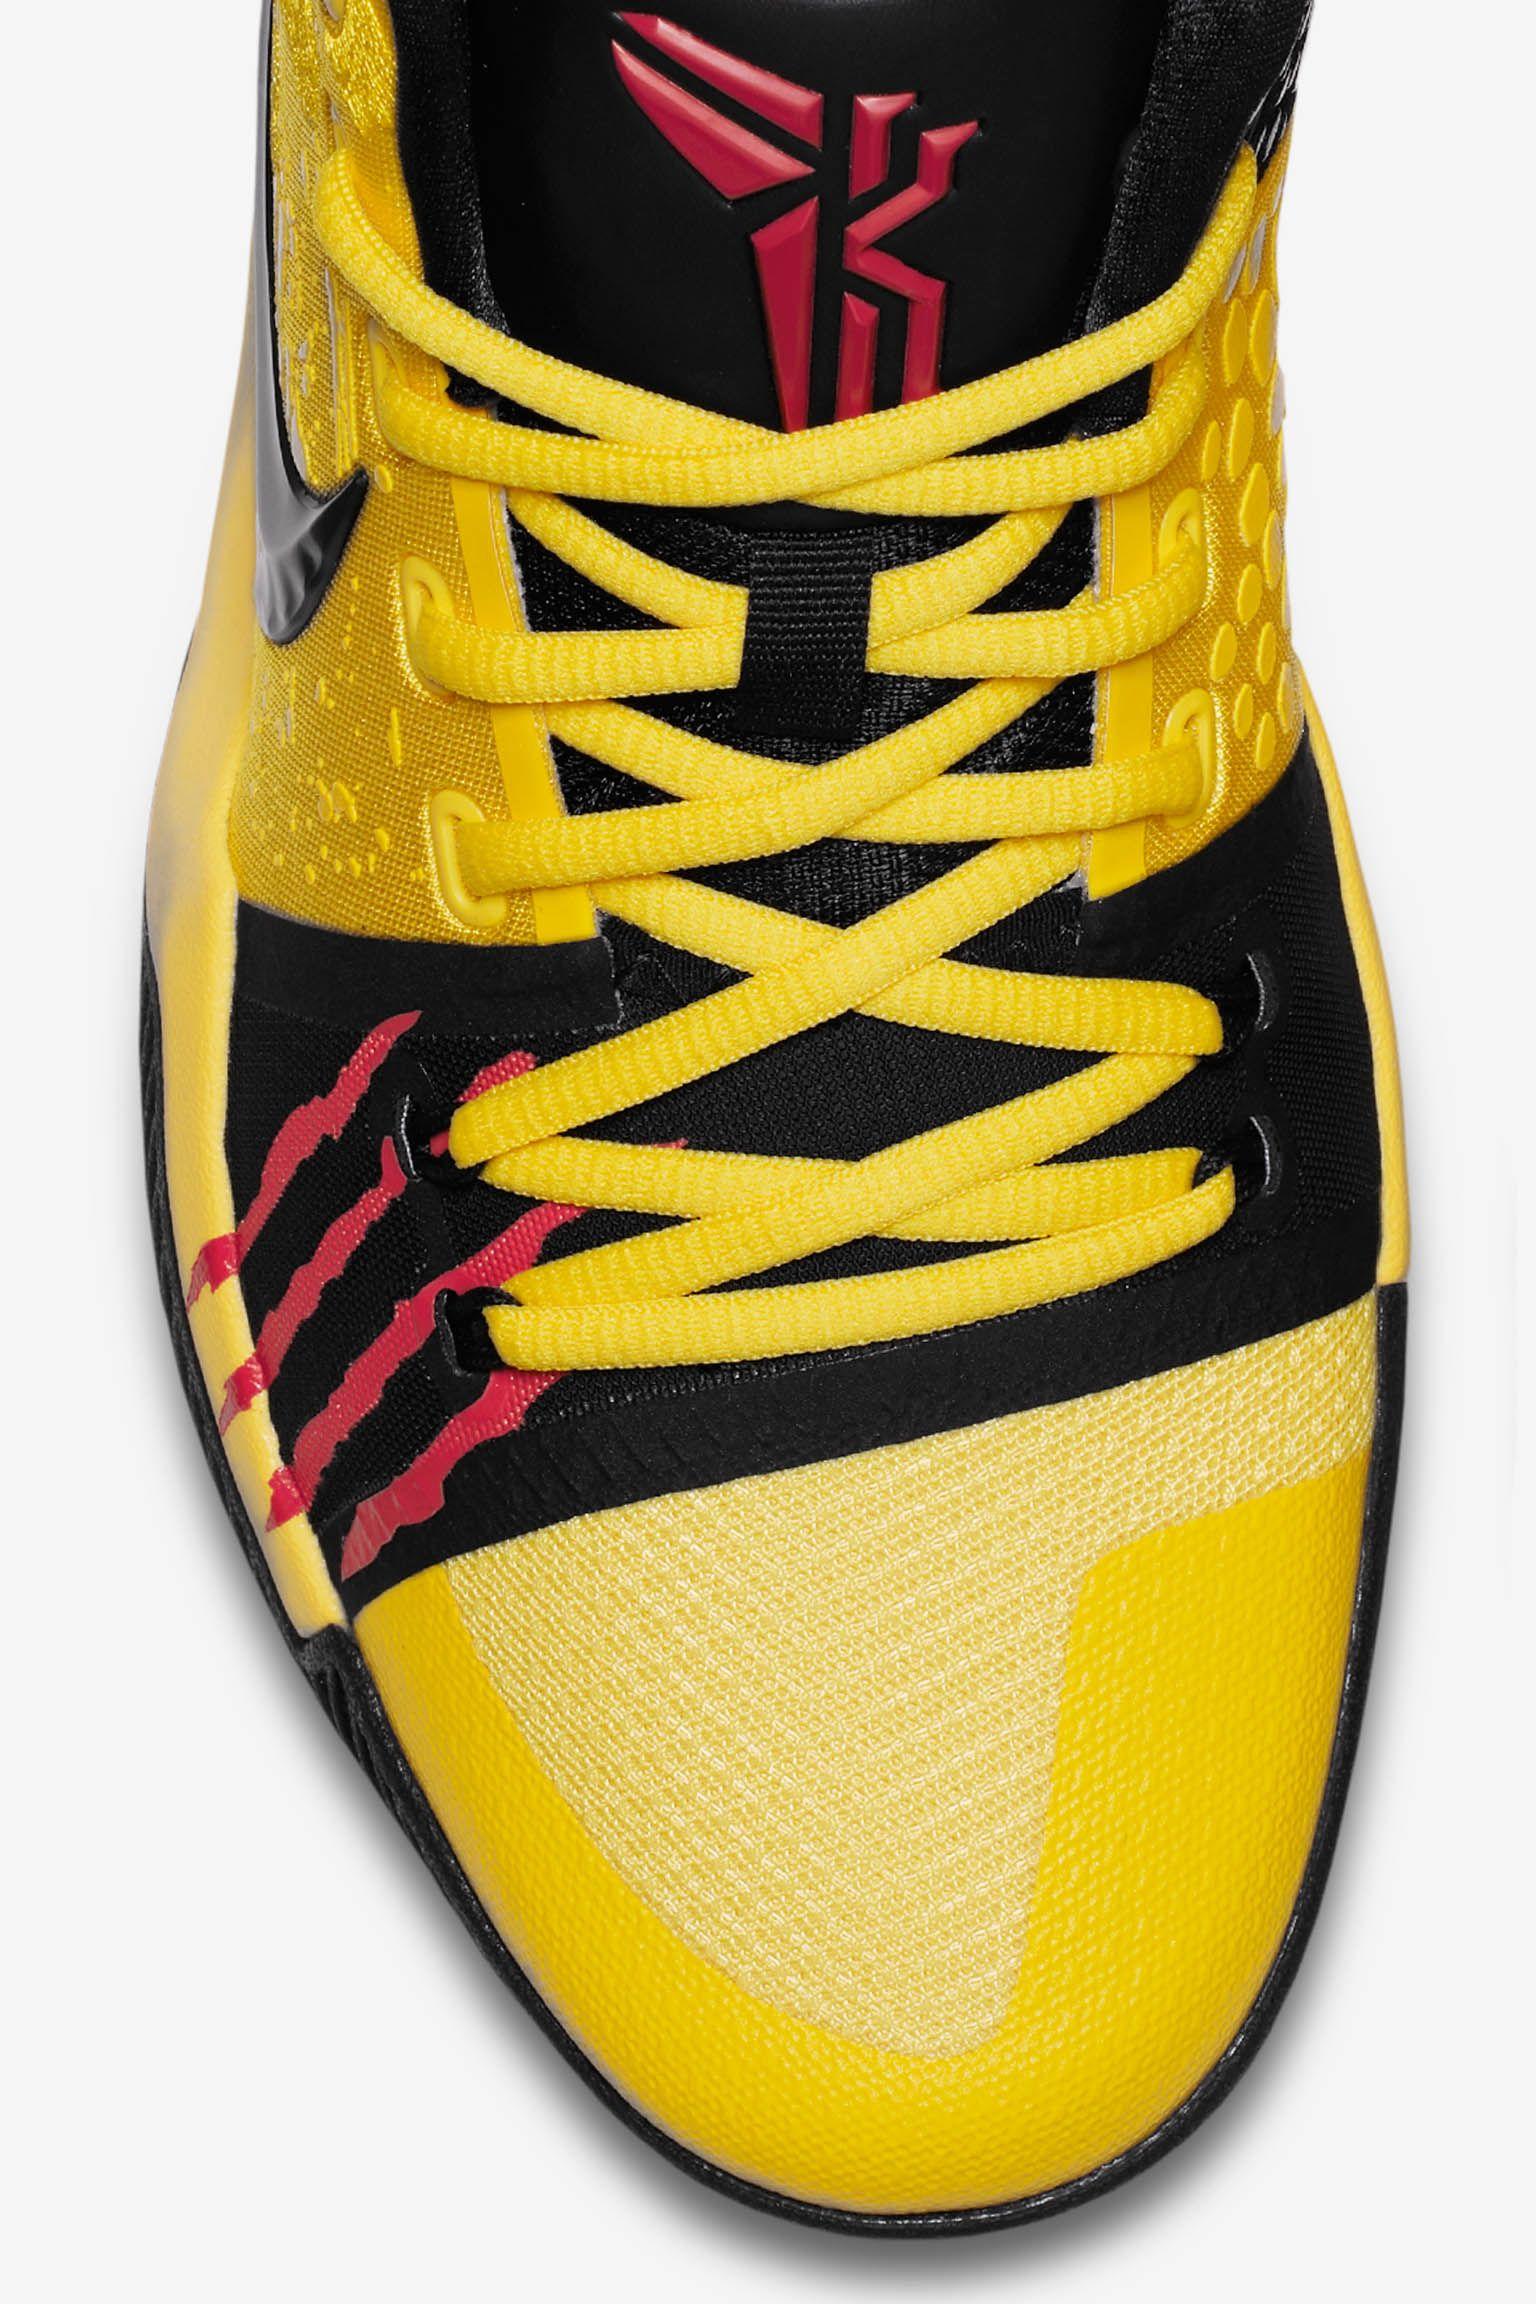 Nike Kyrie 3 'Mamba Mentality'